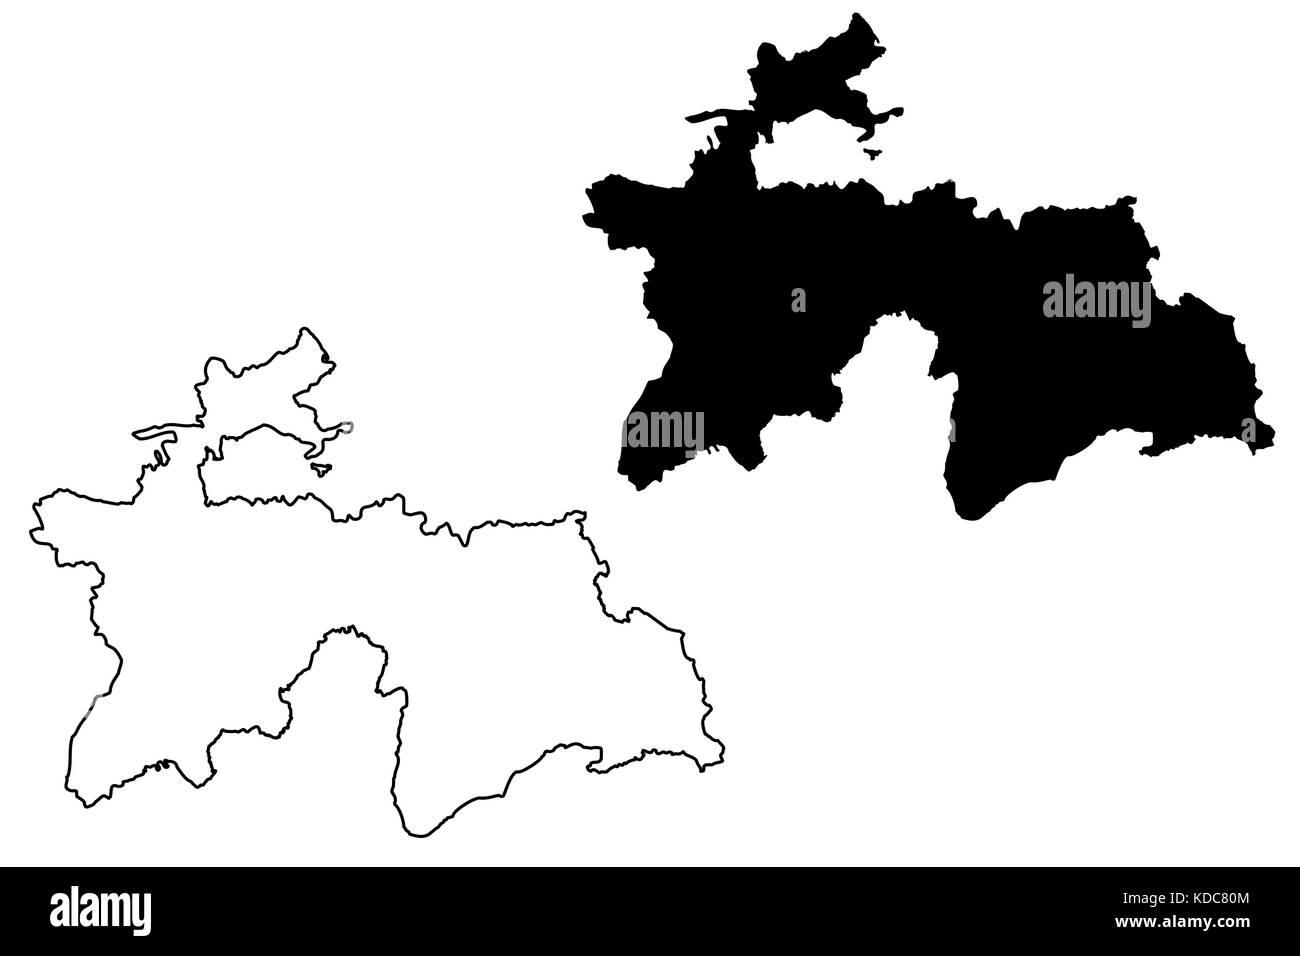 Tajikistan Map Vector Illustration Scribble Sketch Tadjikistan - Tajikistan map vector